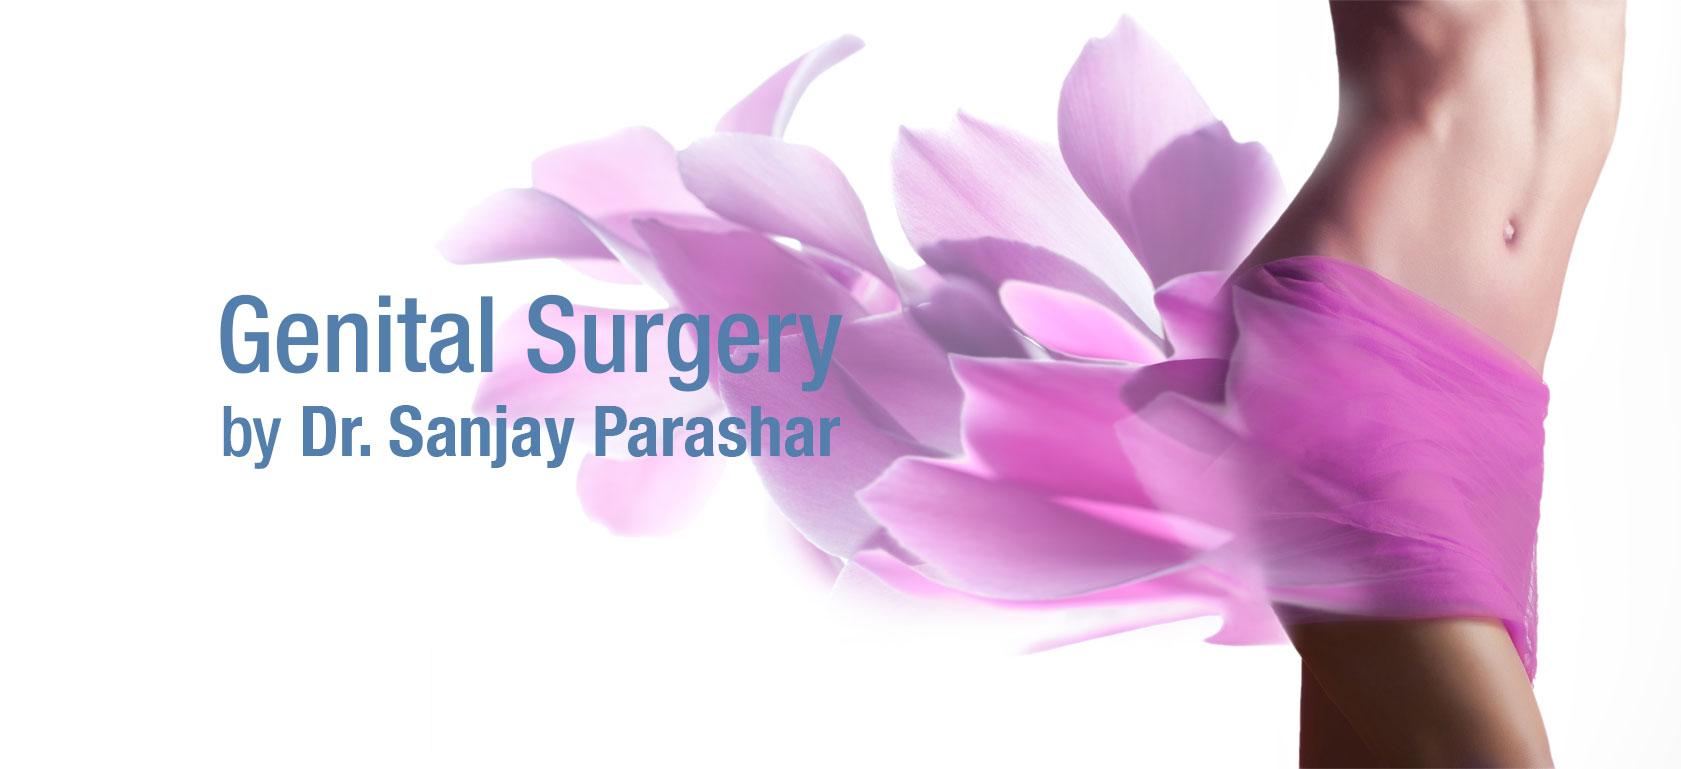 Genital Reconstruction Surgery Dubai - By Dr Sanjay Parashar